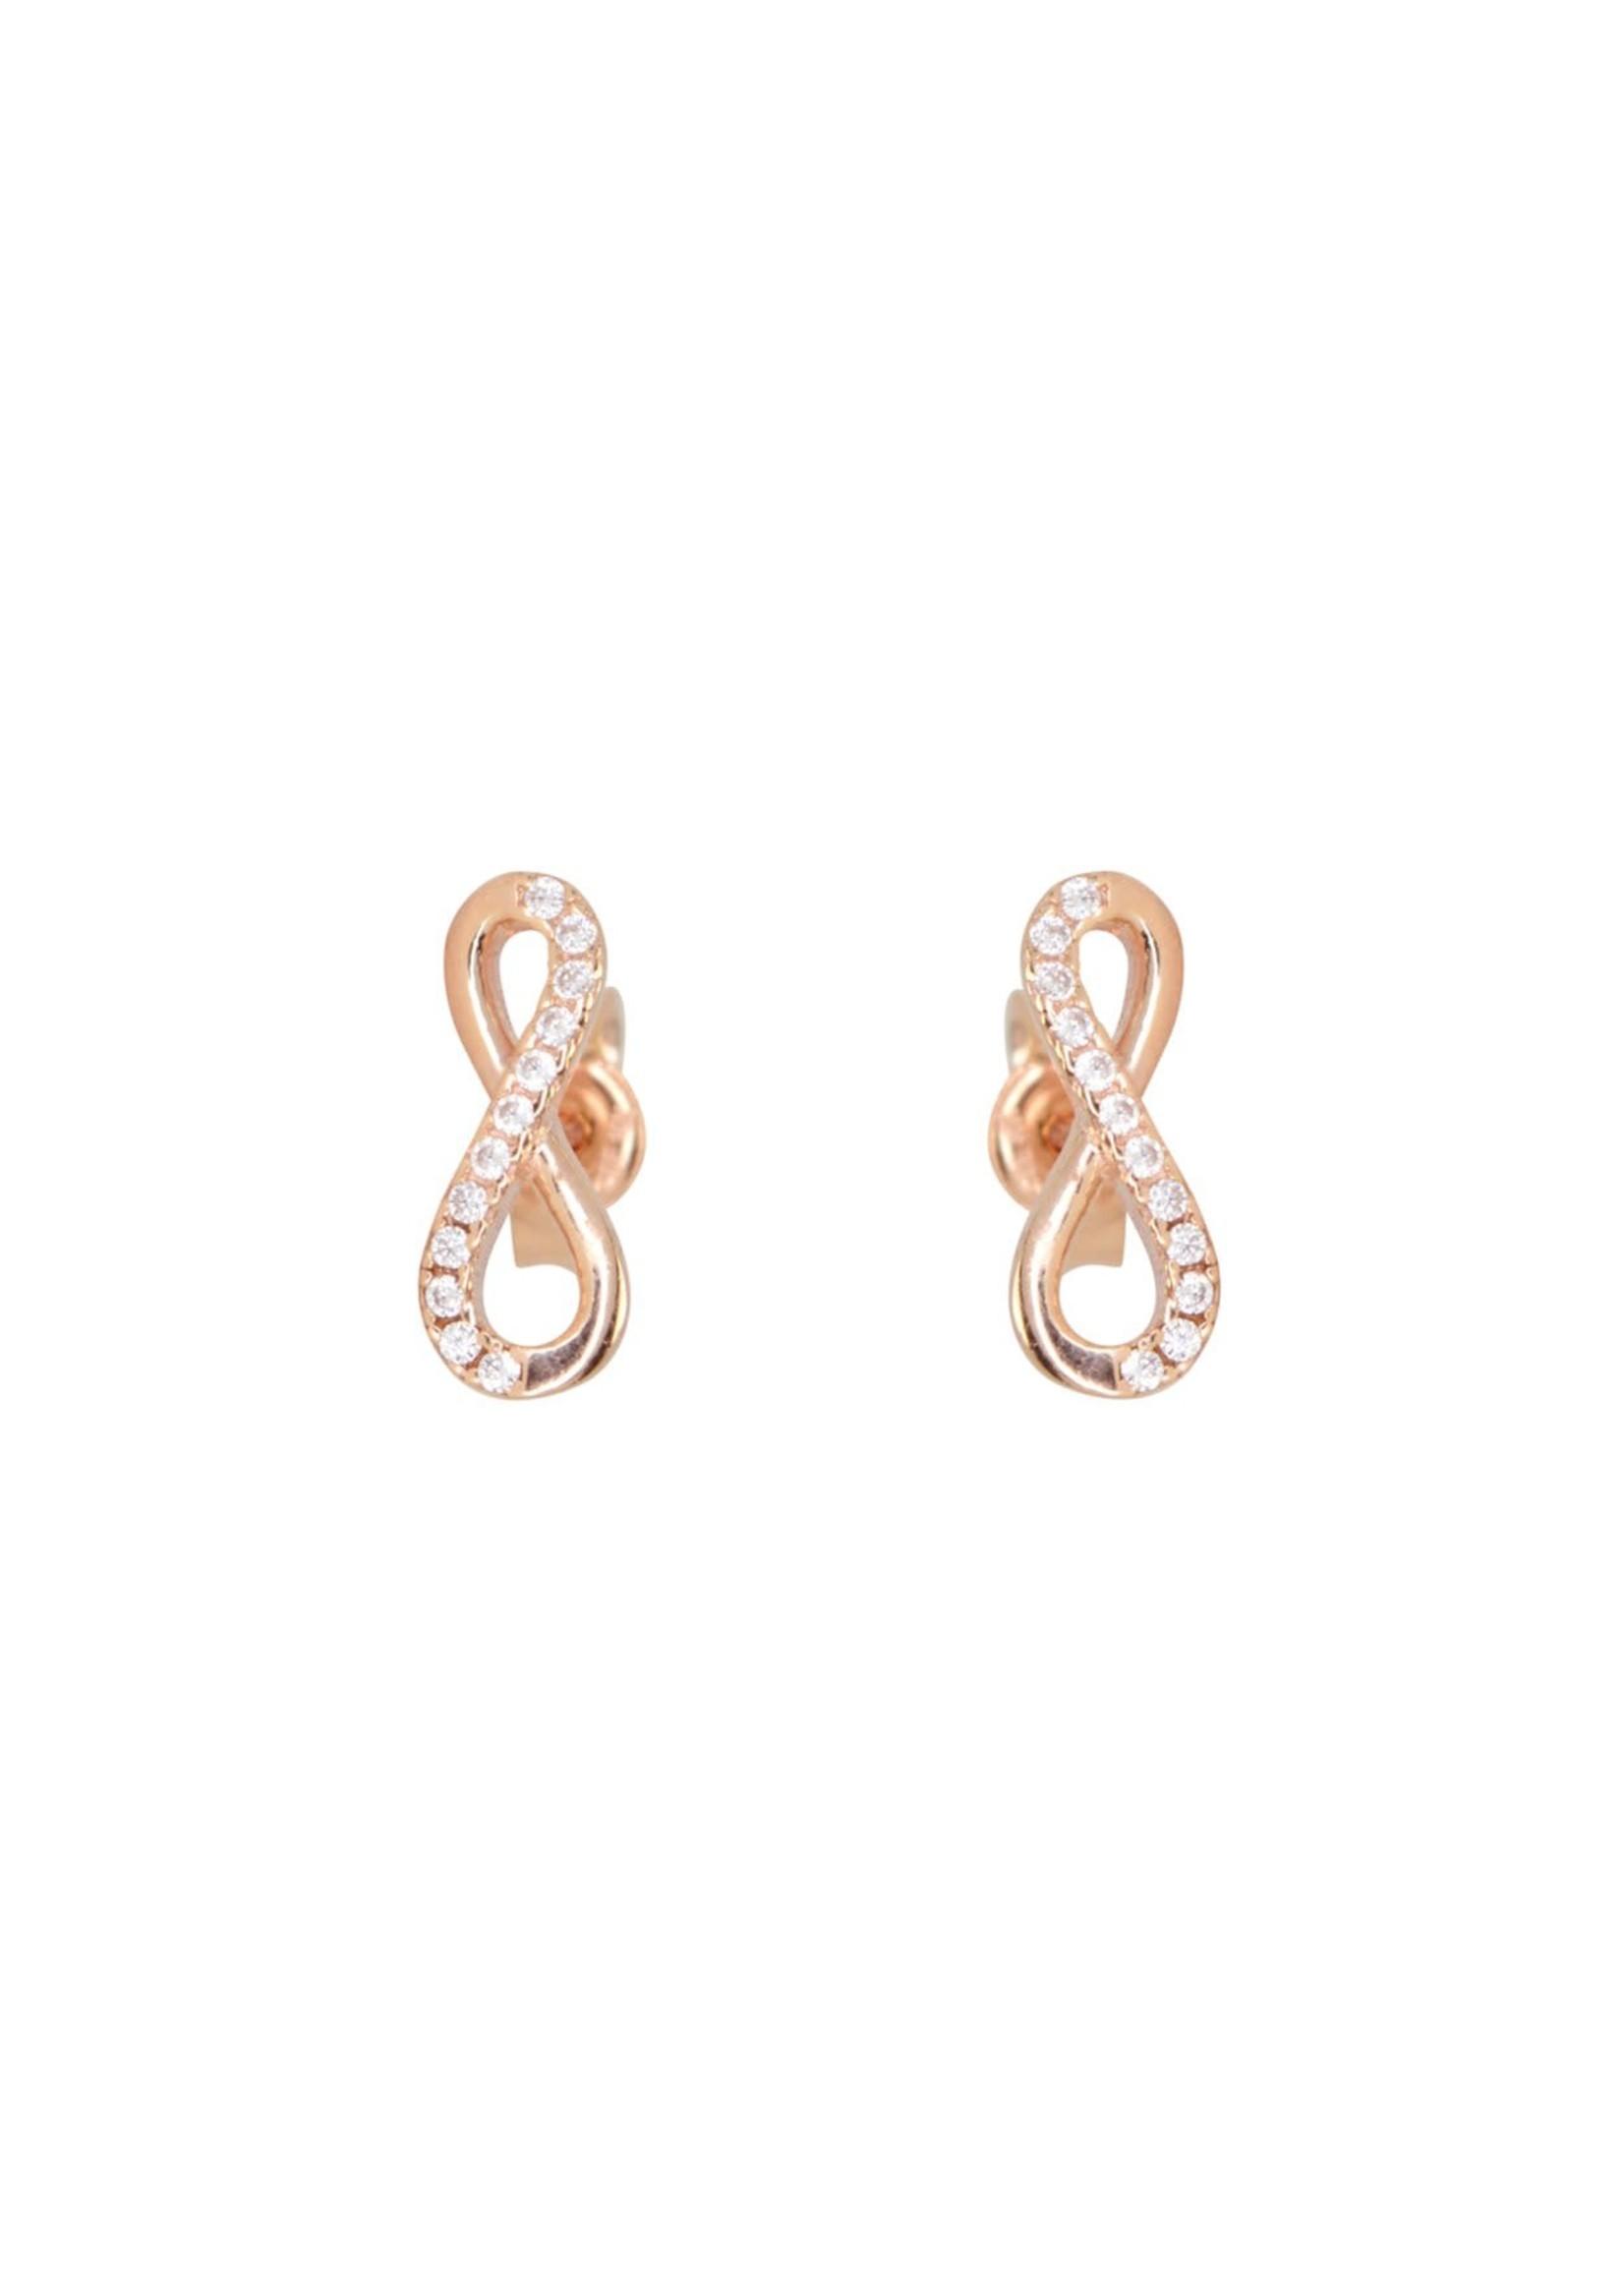 Boucles d'oreilles Stud Infini Or rose 10K